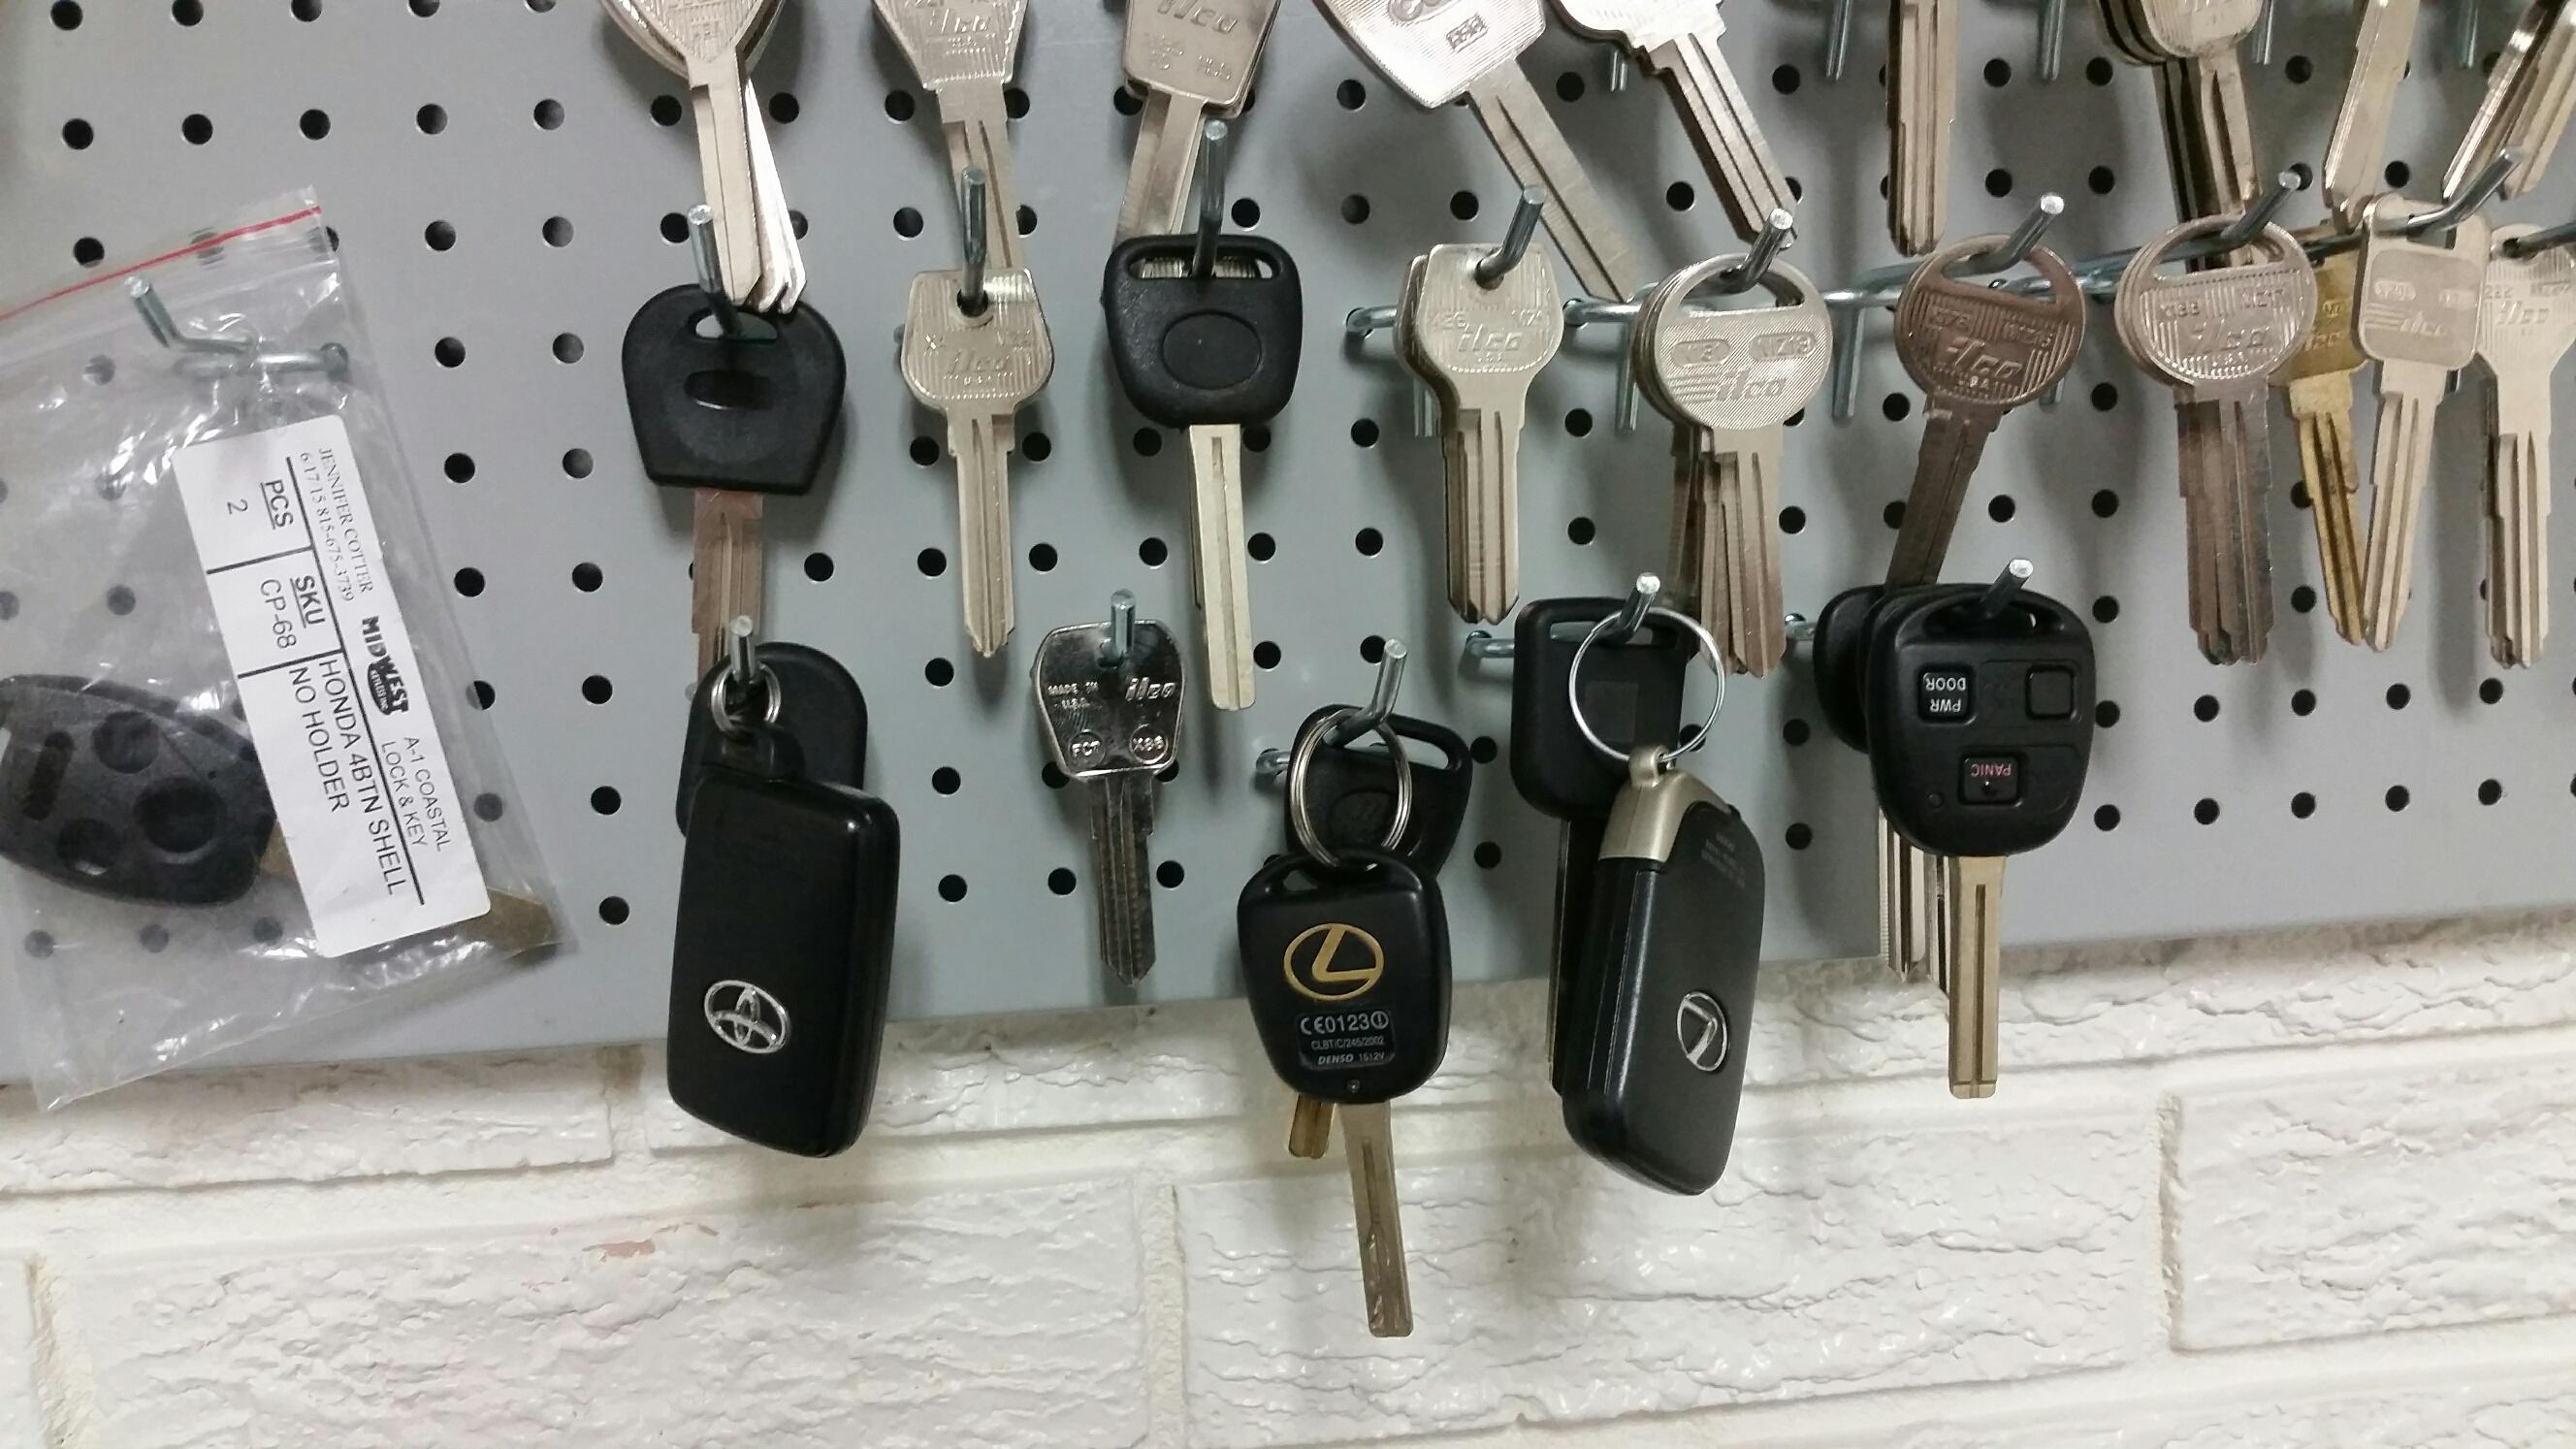 Replacement Car Key Leland NC